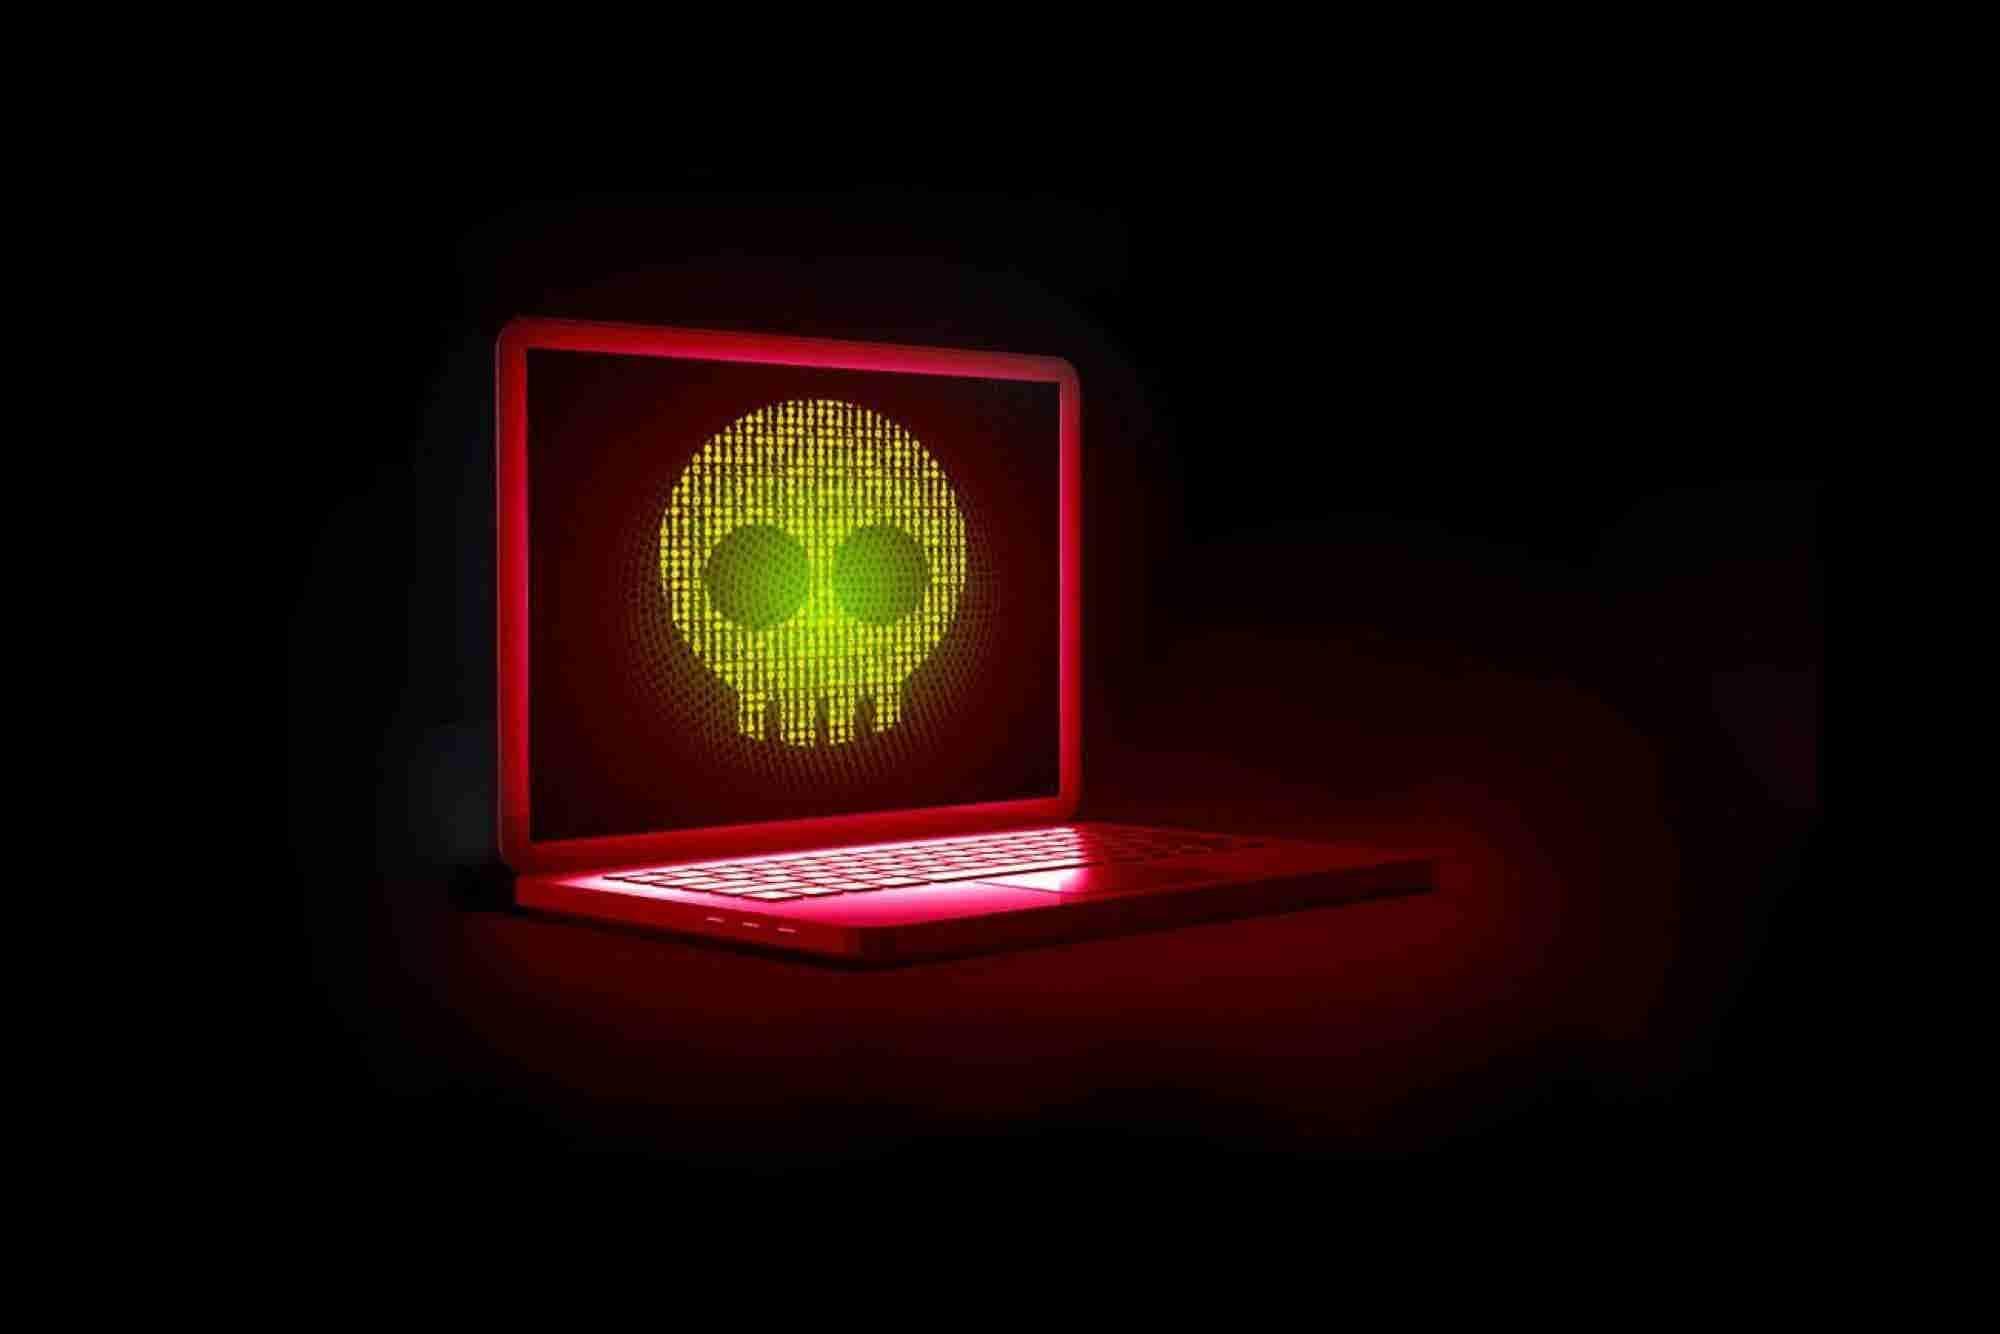 U.S. Shuts Down Huge Online Dark Web Market, AlphaBay